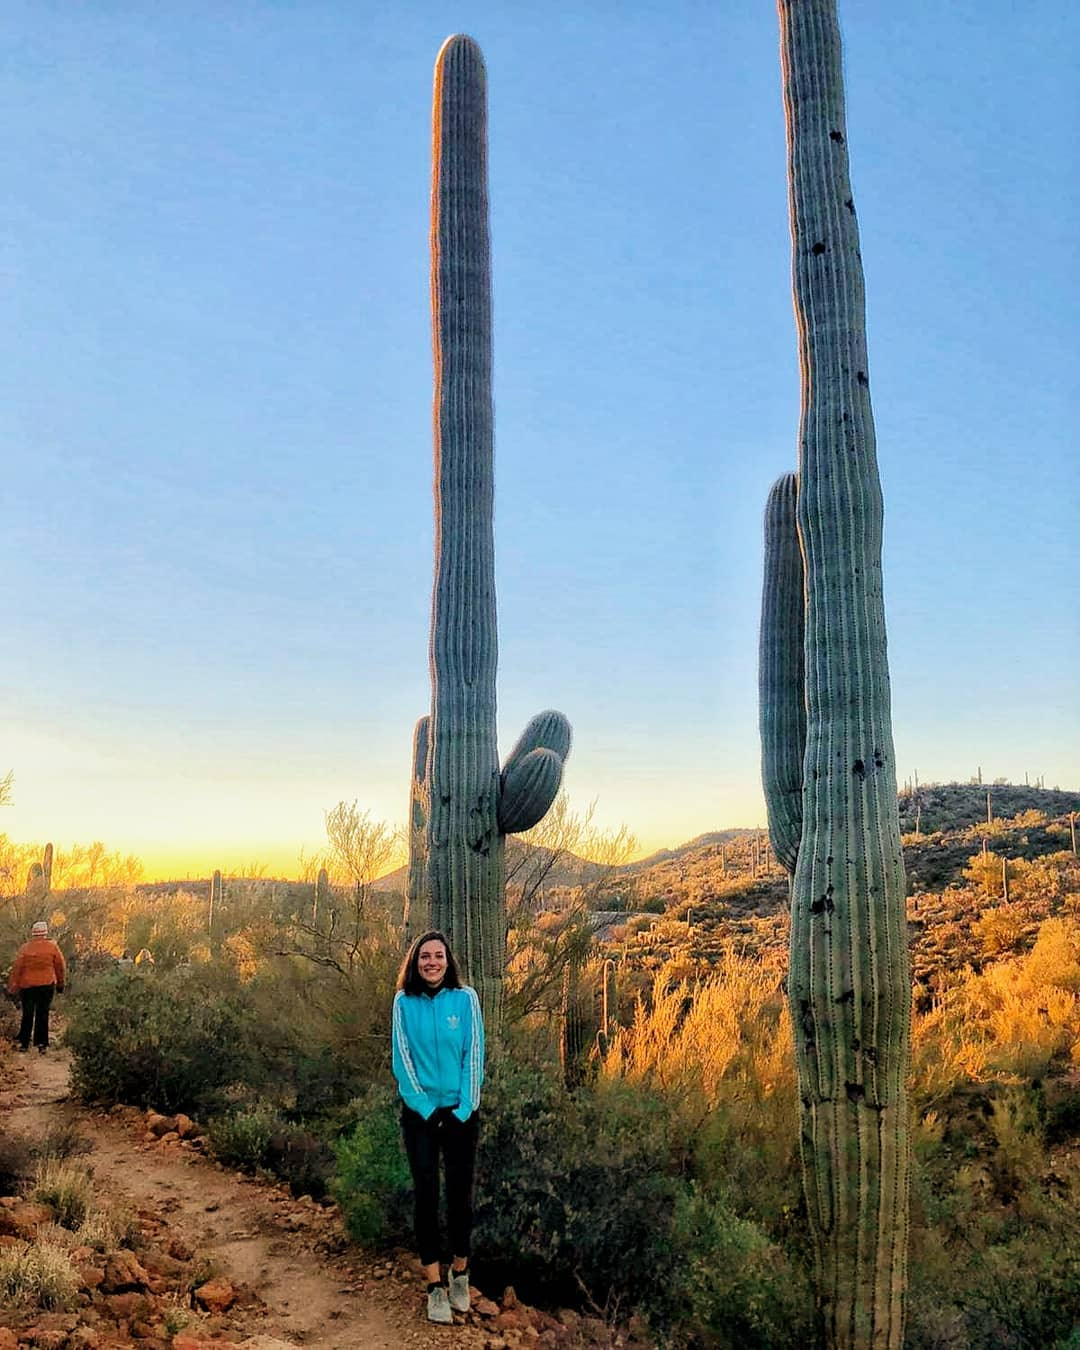 Cactus Tall AZ